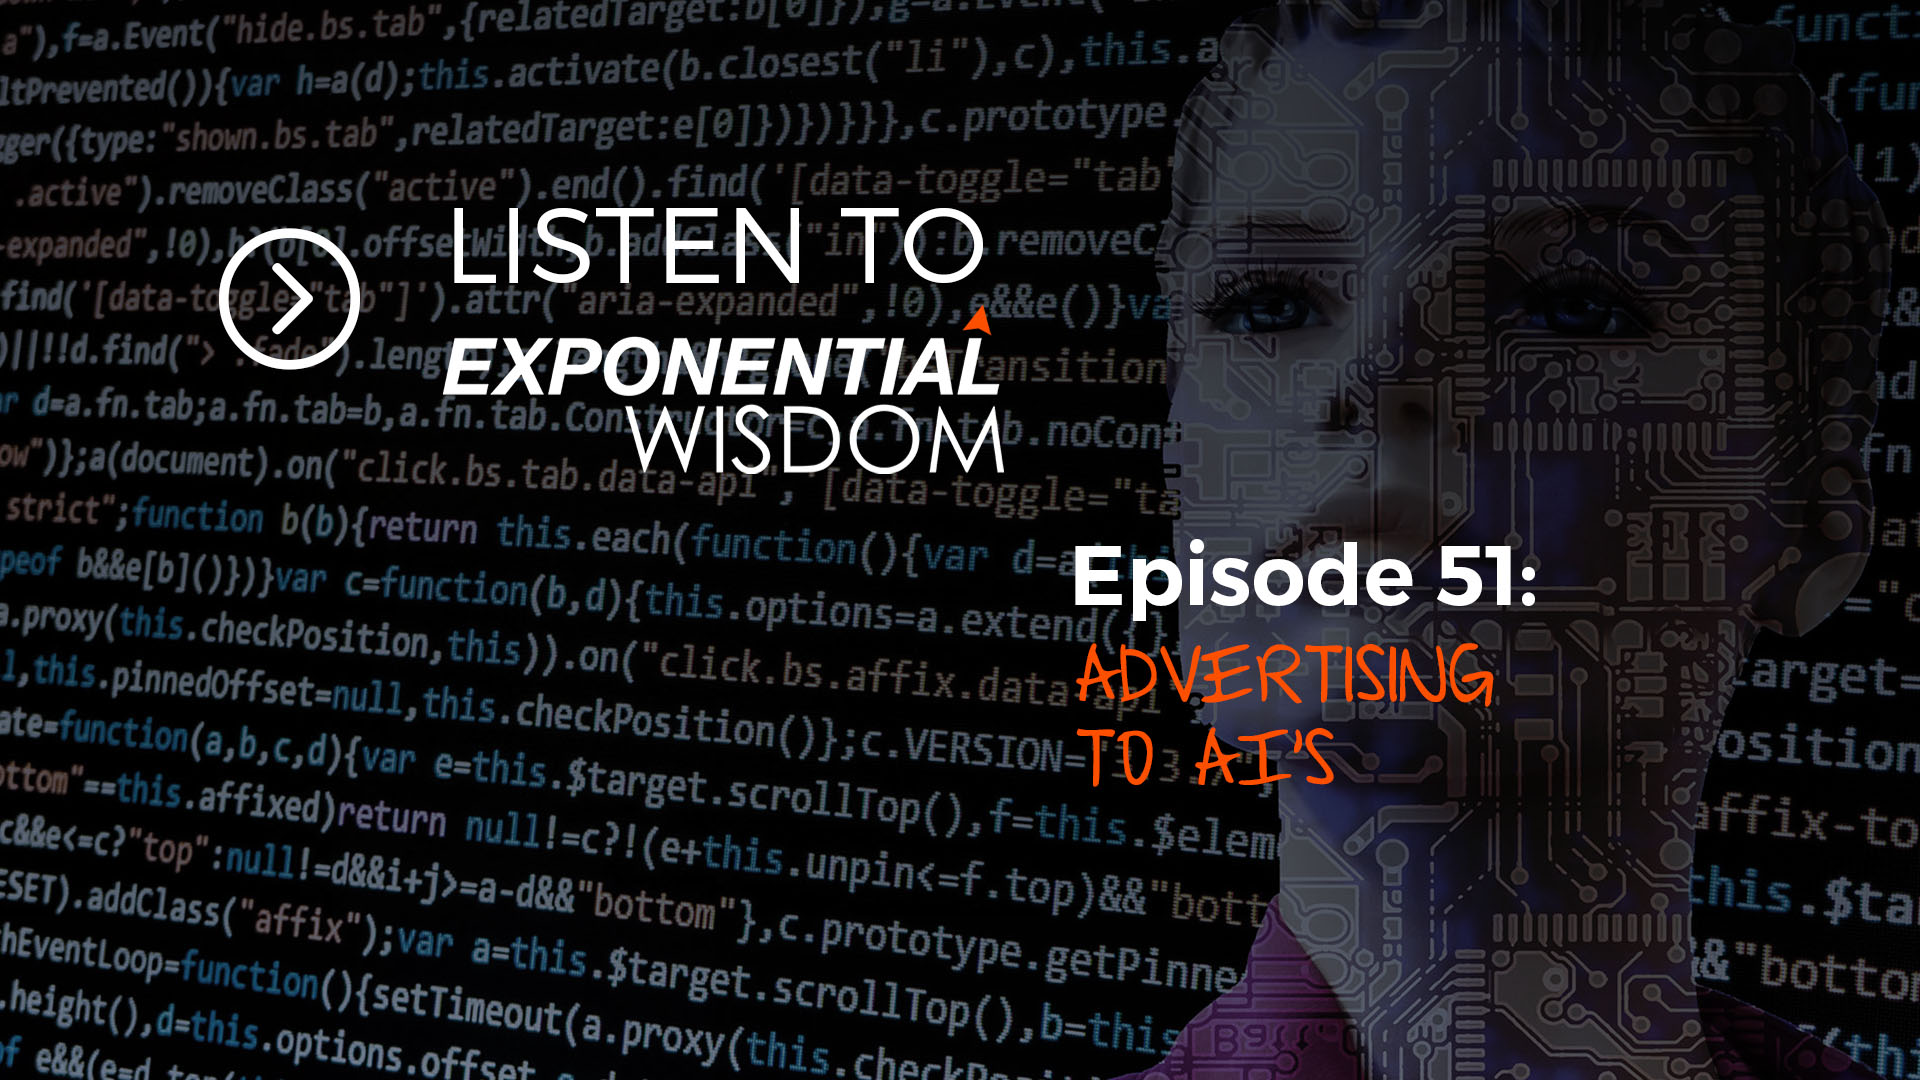 Advertising to AI